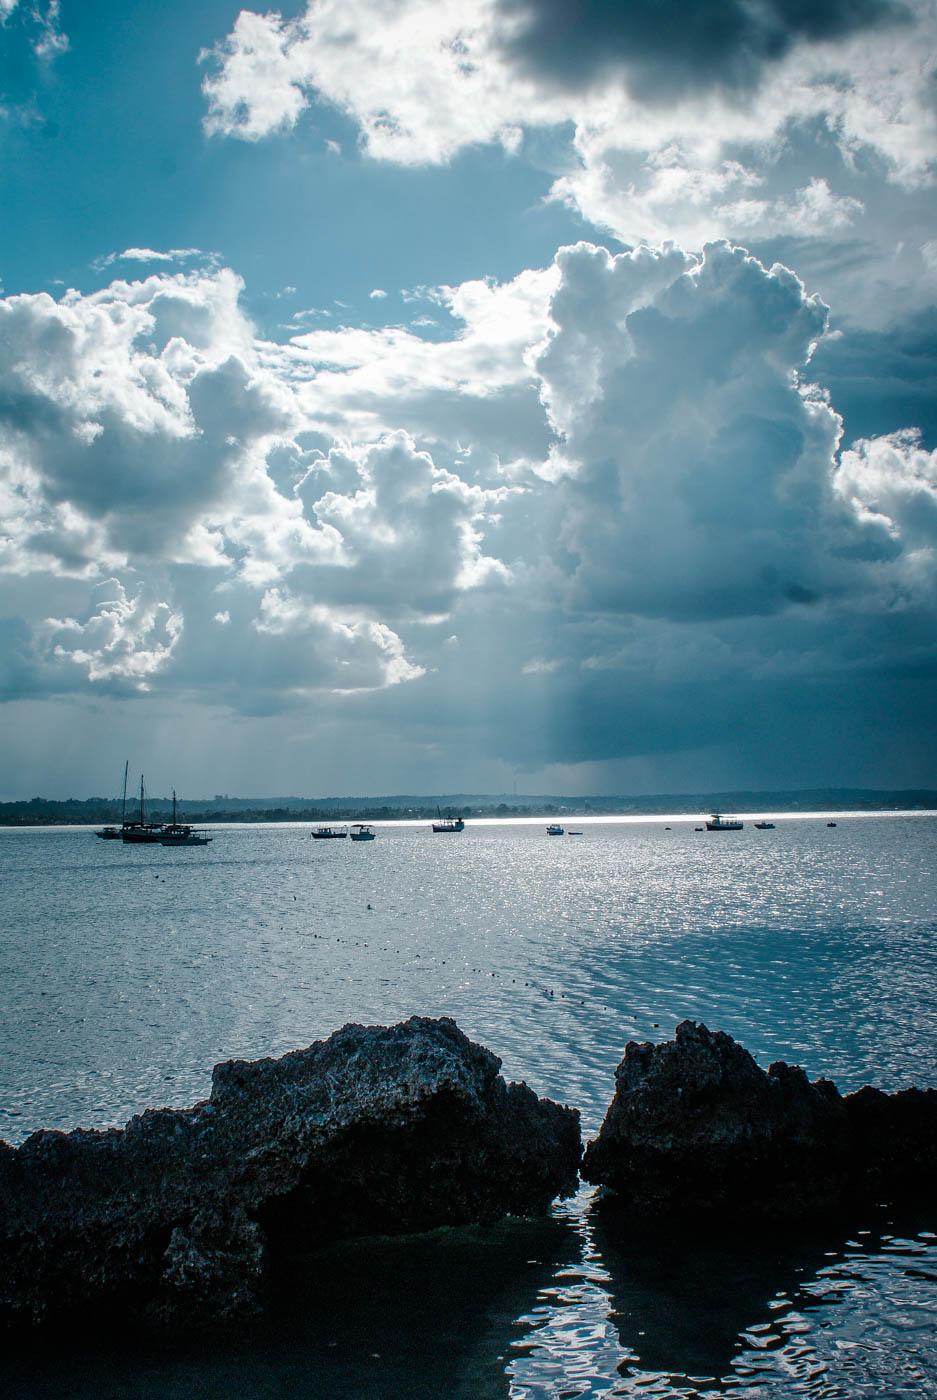 Tanzania and Zanzibar - an exotic adventure. Beaches I Stone Town I Africa Travel I Dar Es Salaam #traveldestinations #traveltheworld #tanzania